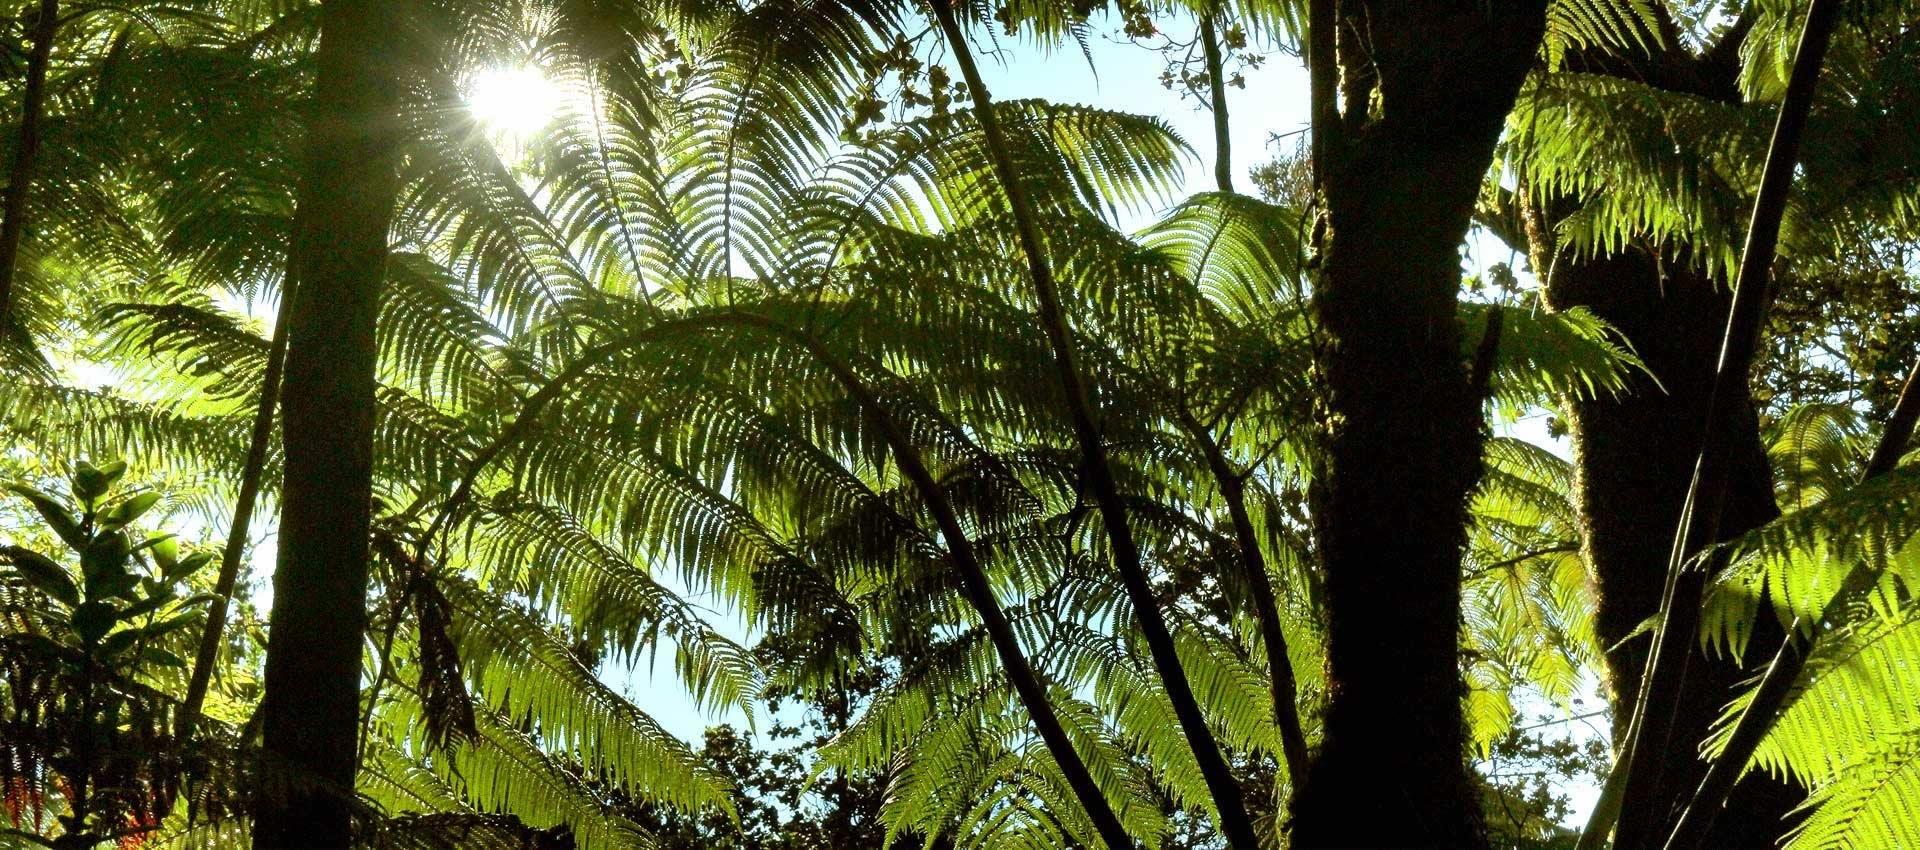 Volcano-Hawaii-tree-rainforest